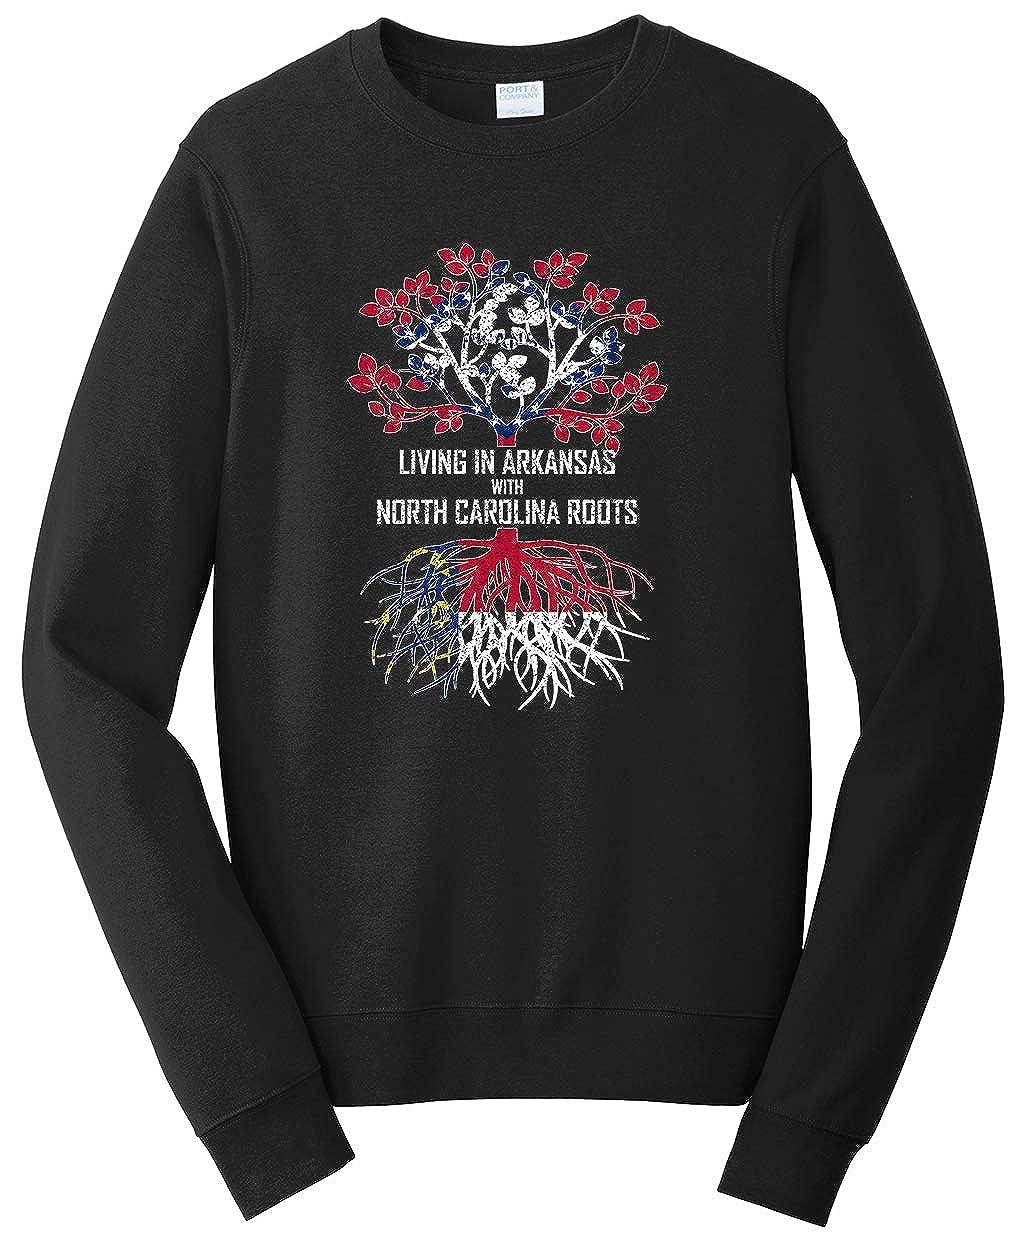 Tenacitee Unisex Living in Arkansas North Carolina Roots Sweatshirt